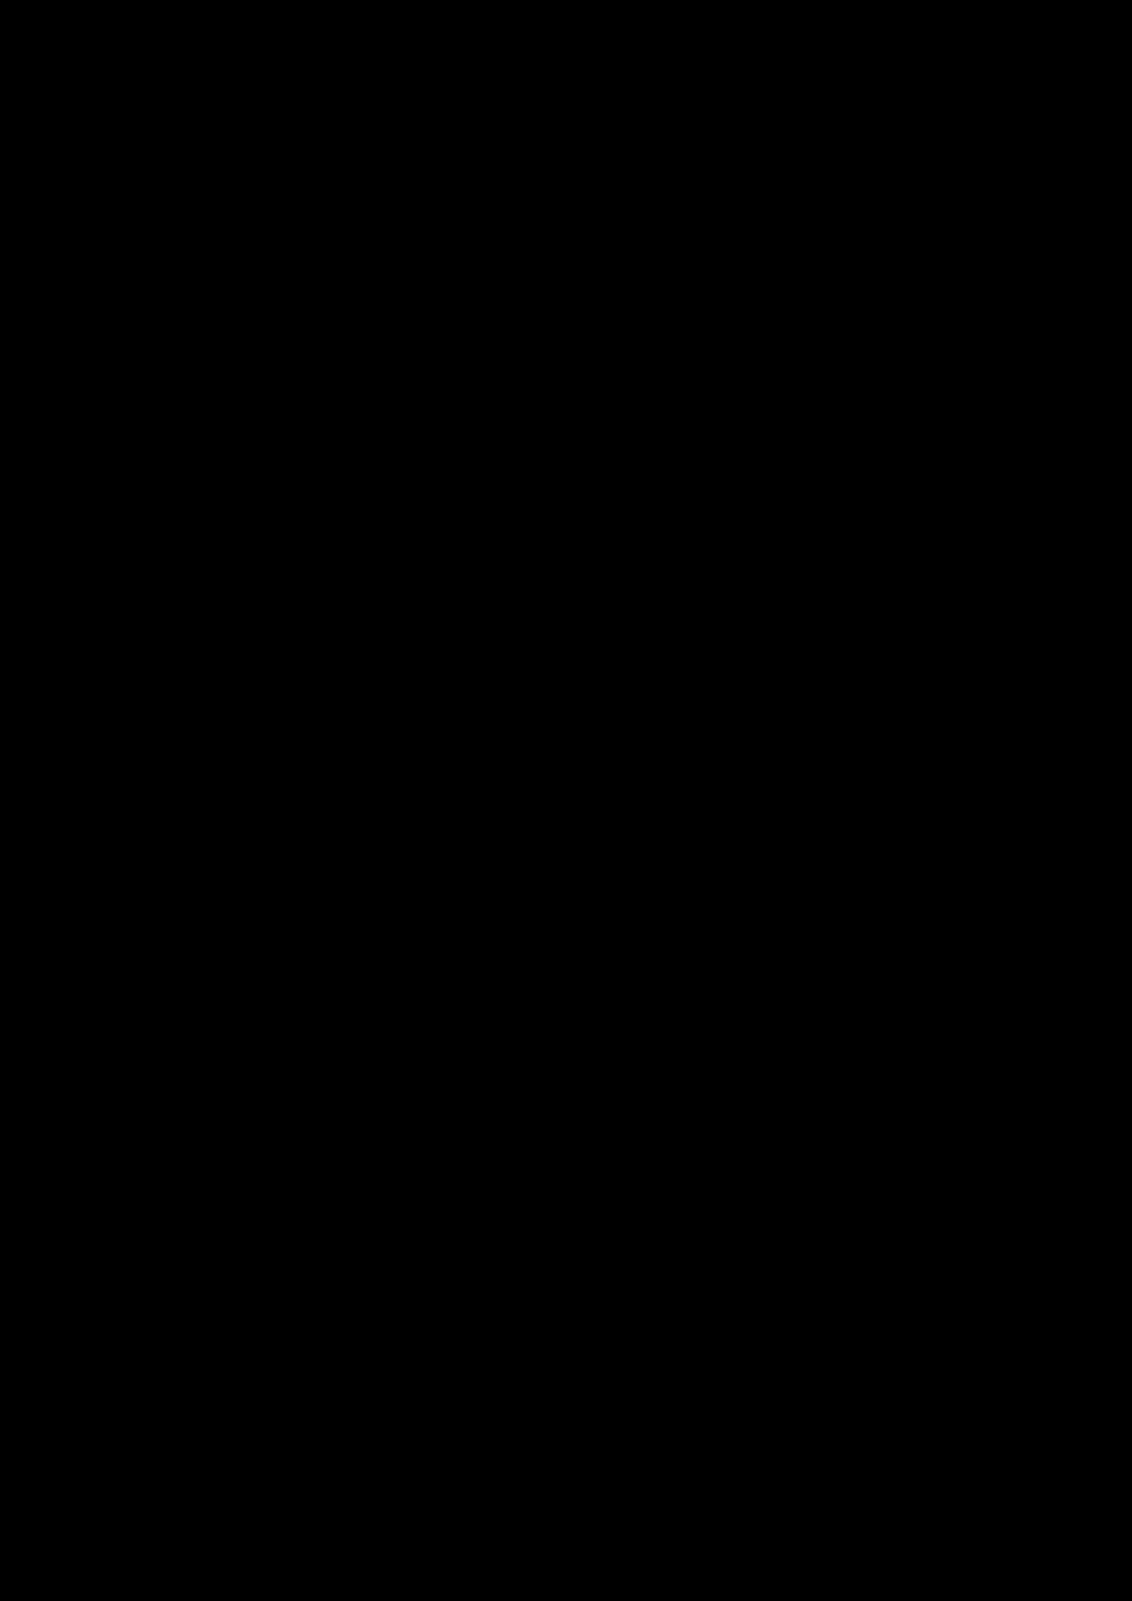 Ten lyubvi slide, Image 3